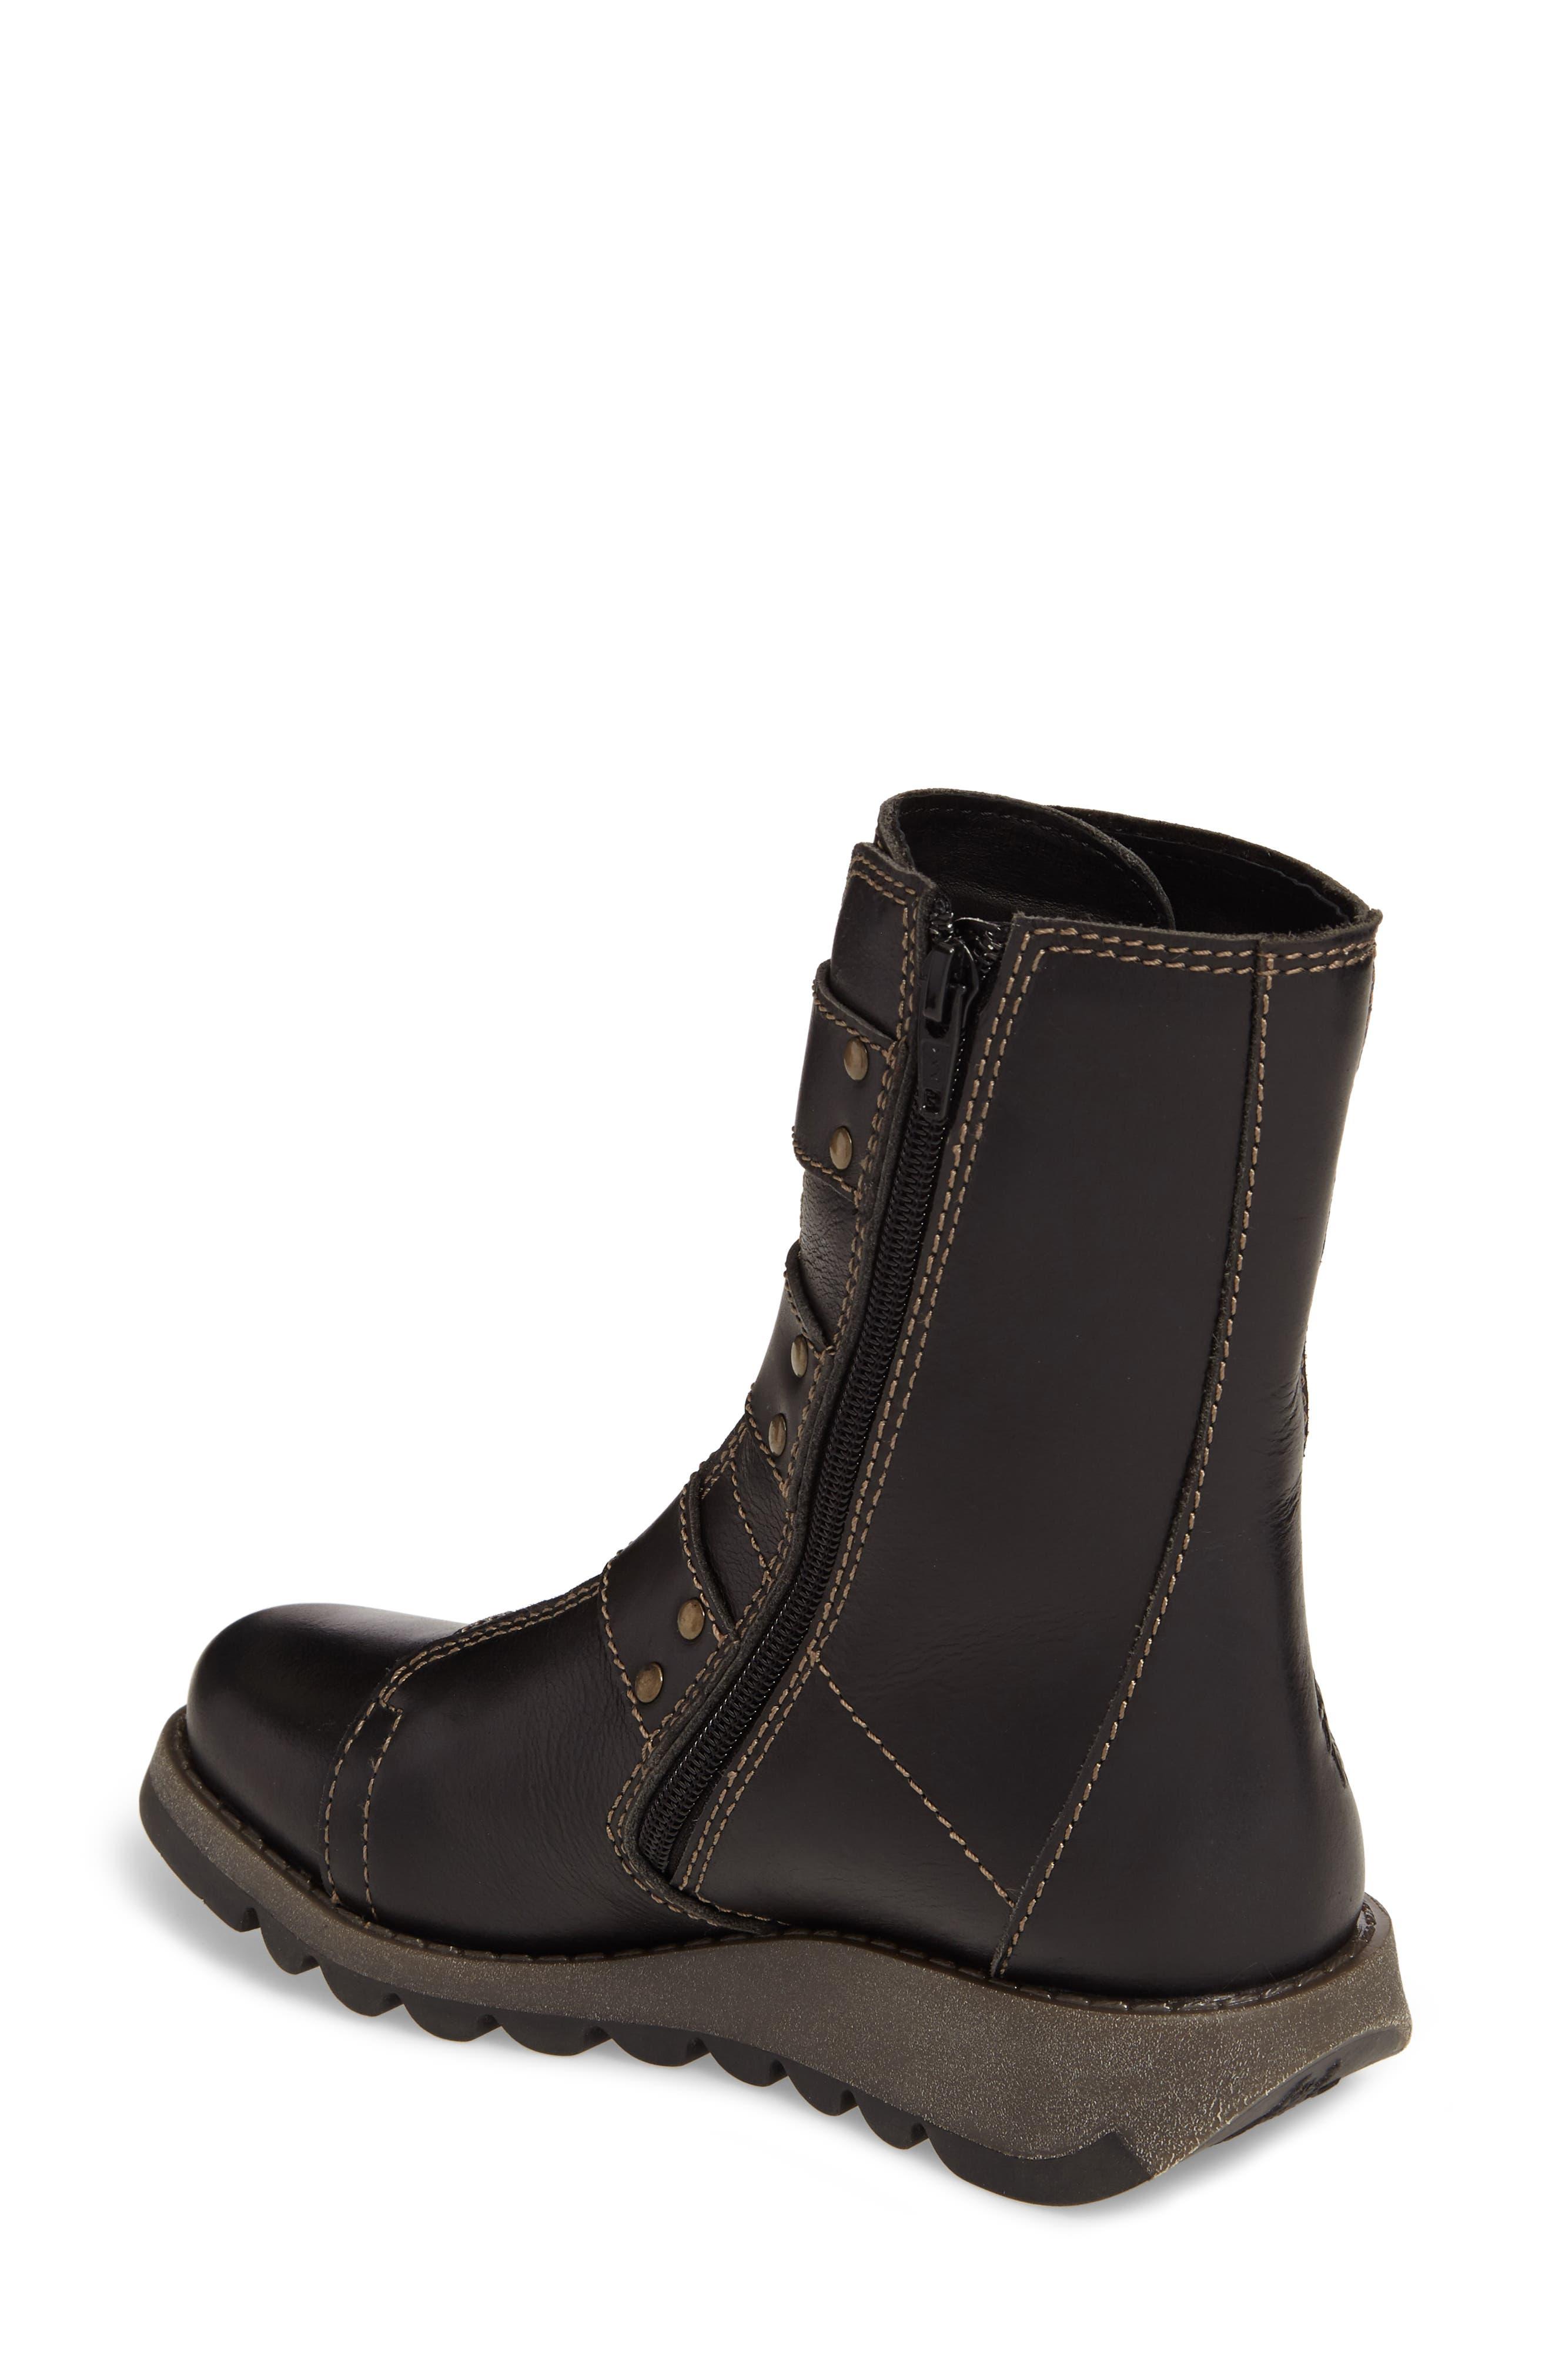 Scop Boot,                             Alternate thumbnail 2, color,                             Black Leather